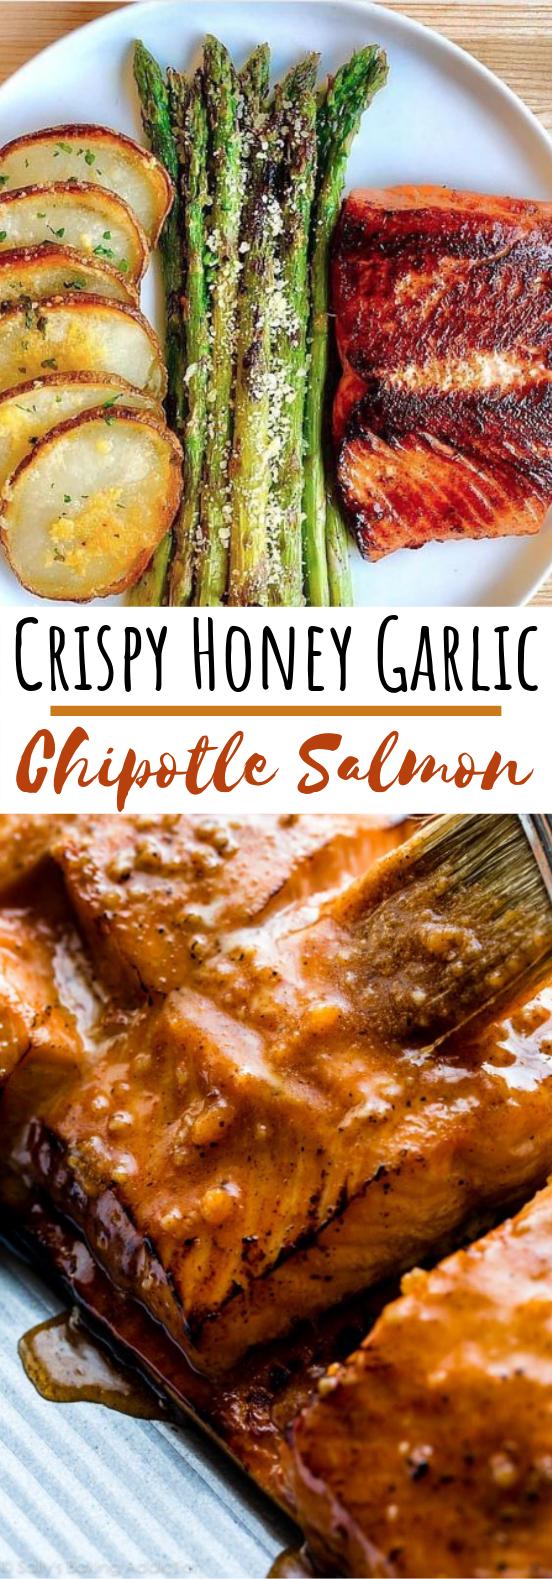 Crispy Honey Garlic Chipotle Salmon #healthy #keto